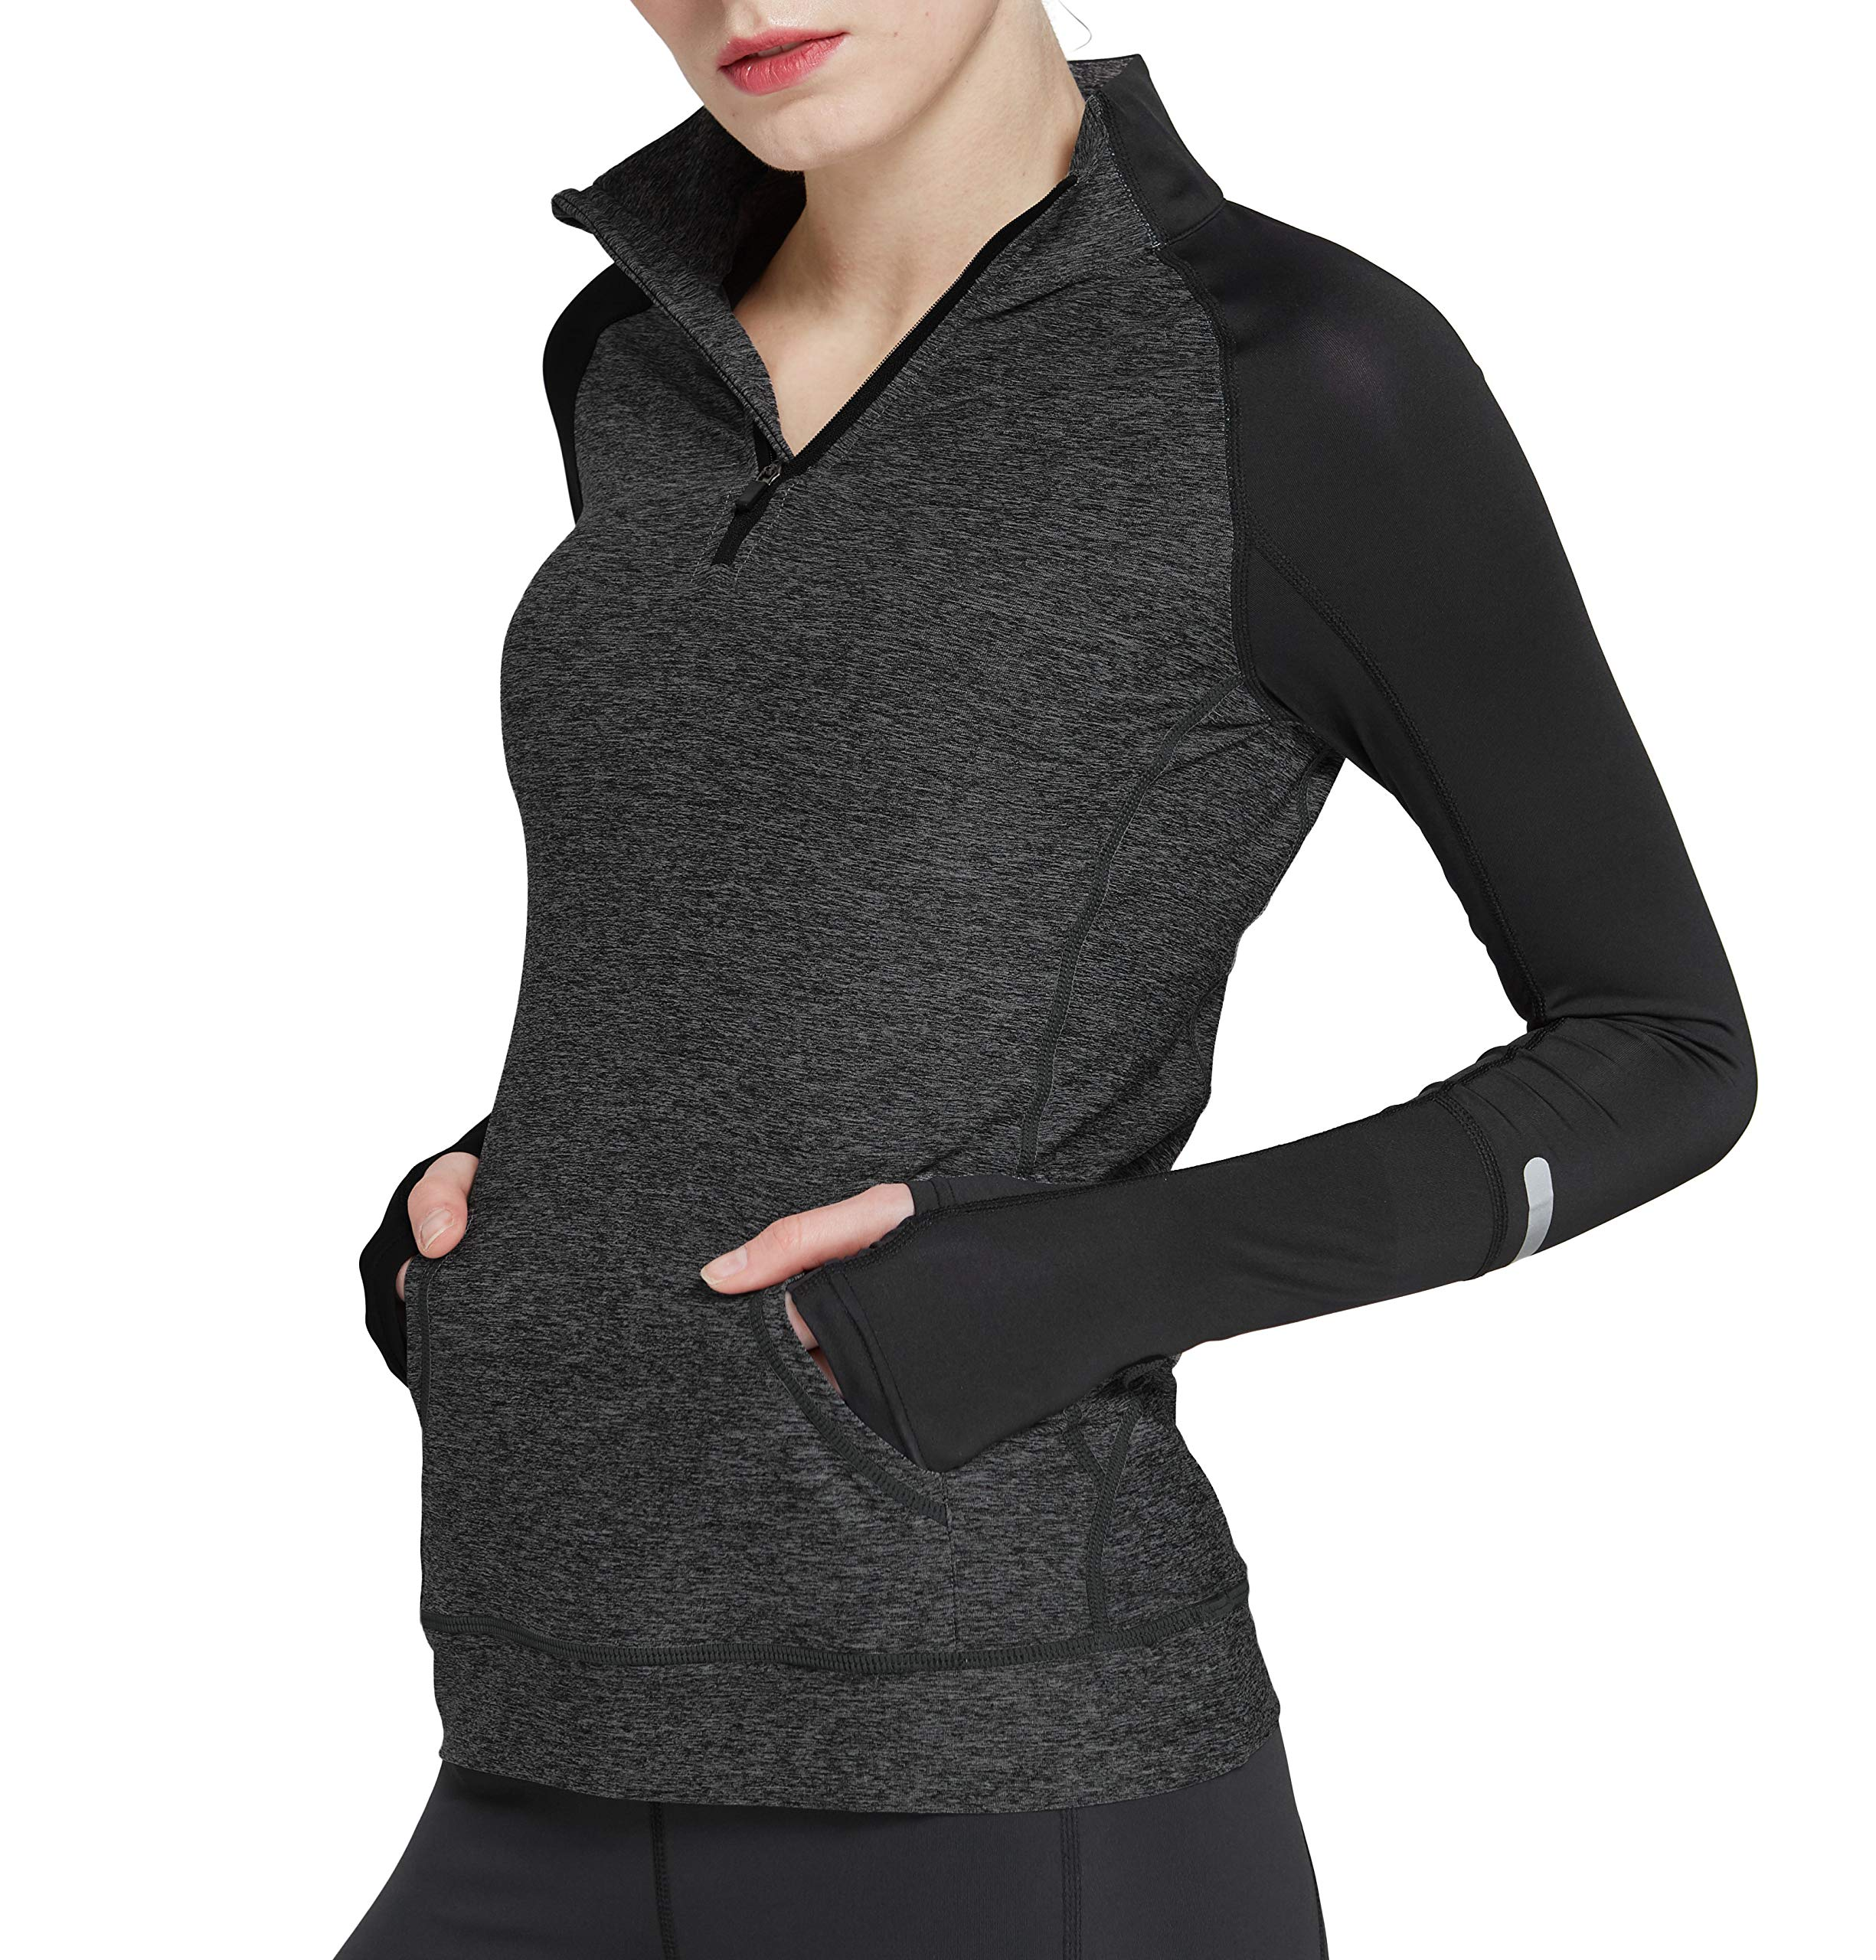 Women's Yoga Long Sleeves Half Zip Sweatshirt Girl Athletic Workout Running Jacket d_gy XL Deep Grey by Cityoung